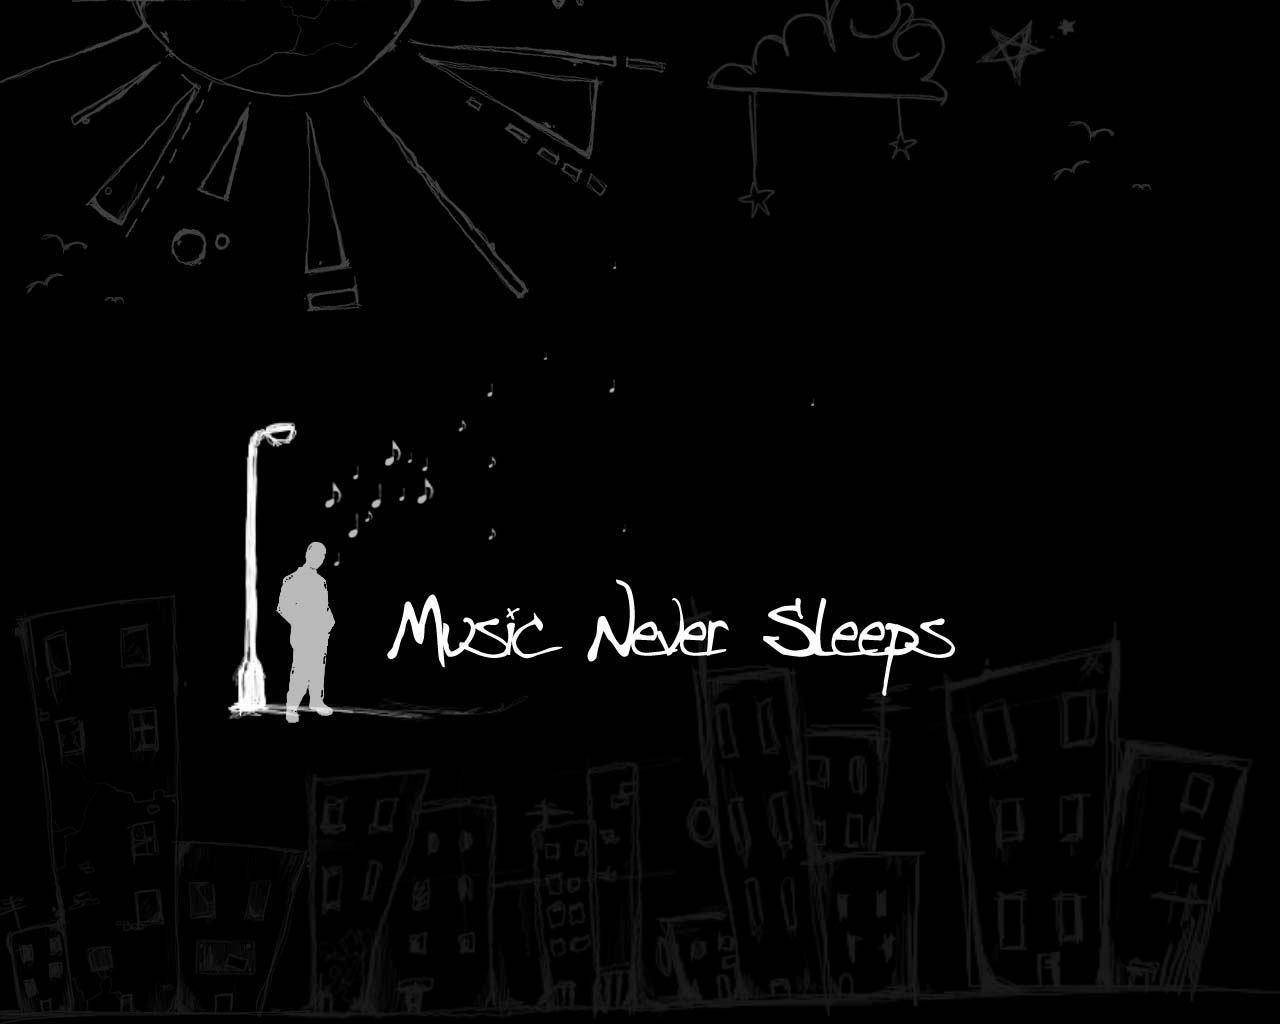 música never sleeps